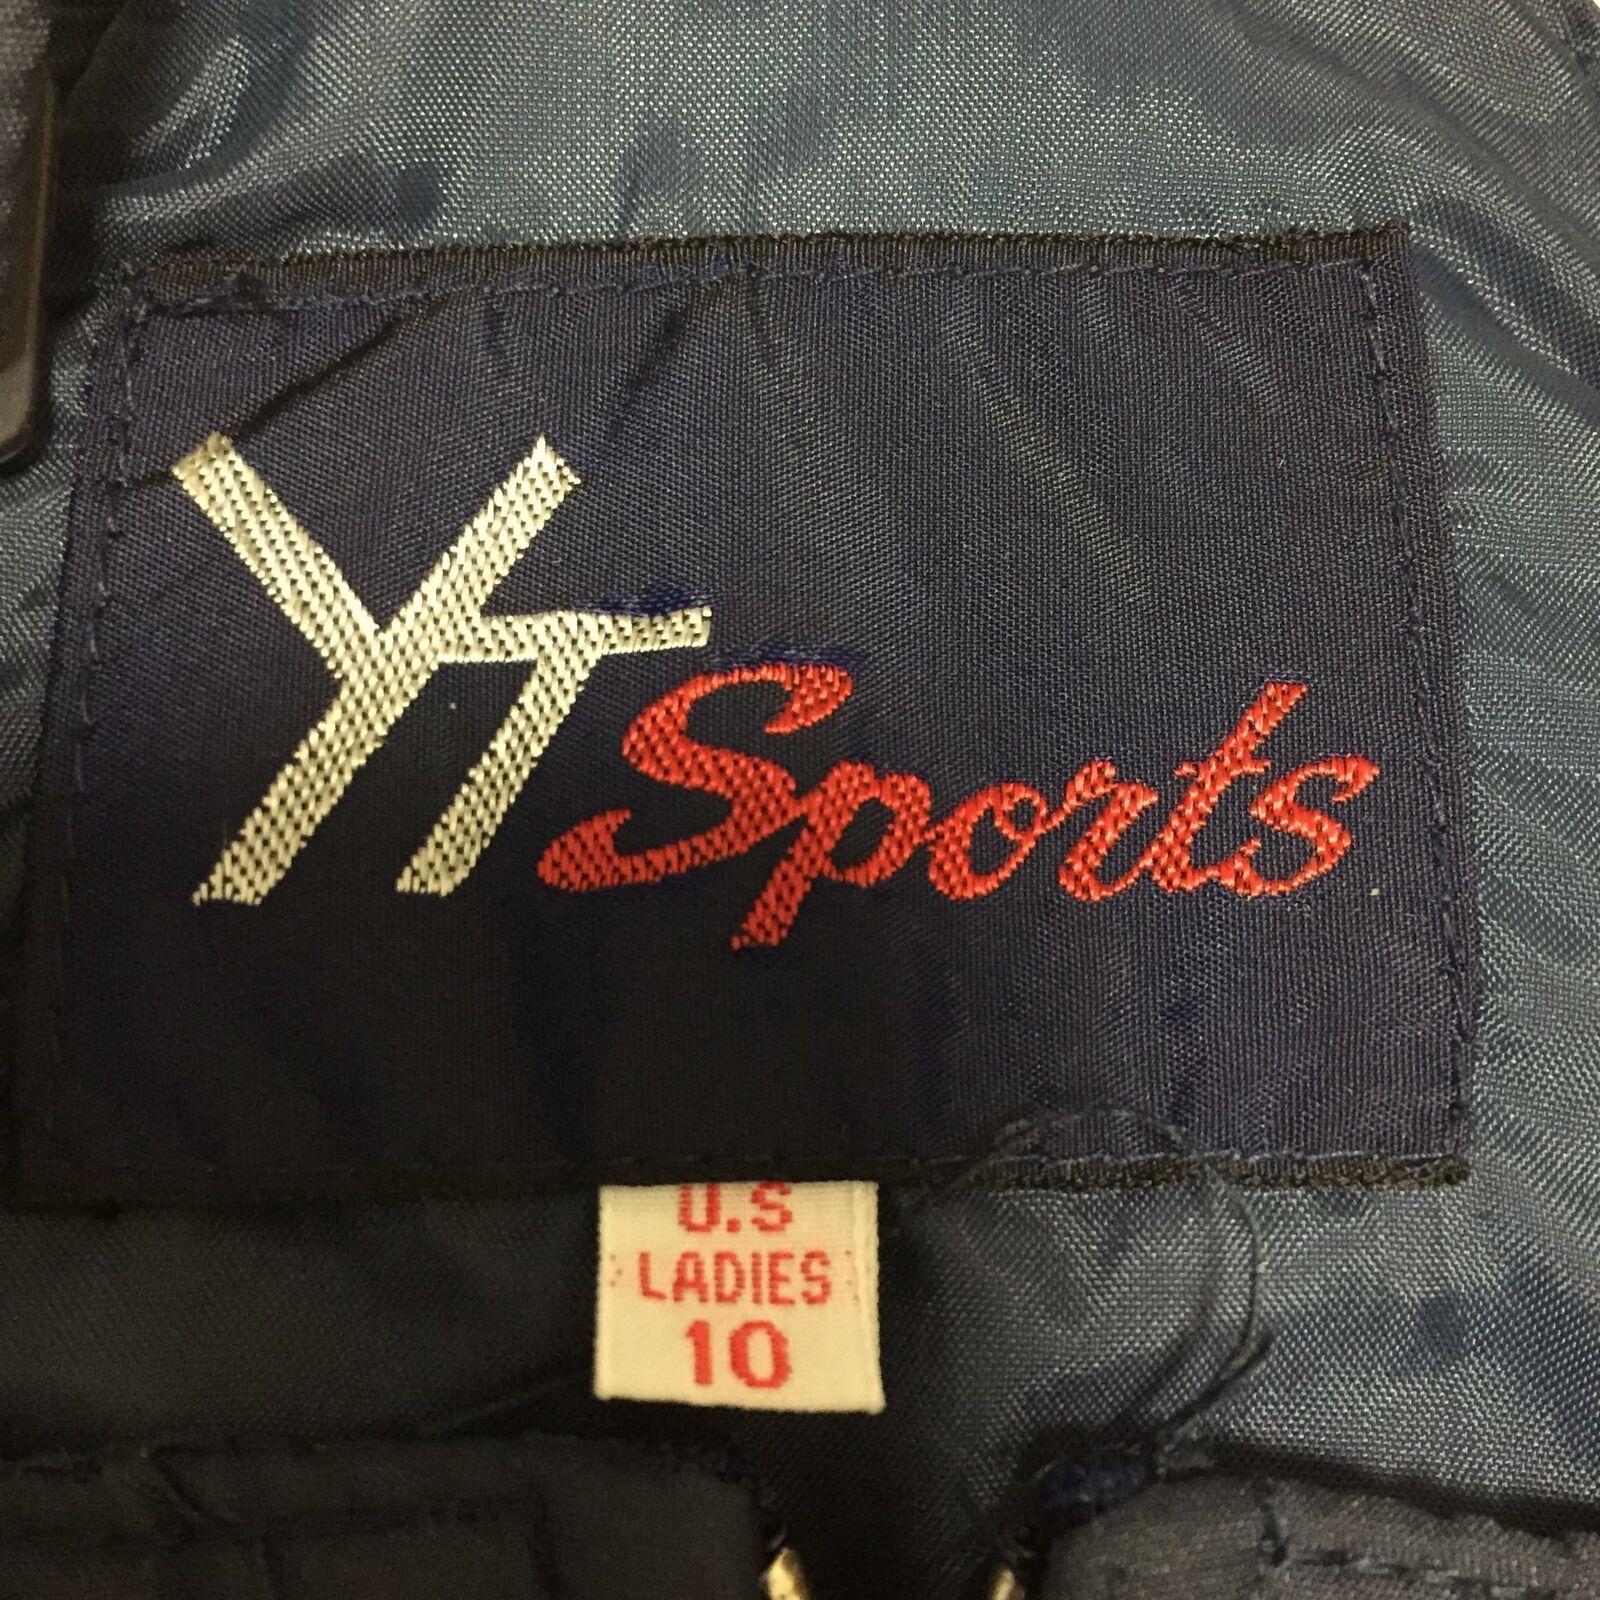 YT Sports Ladies 10 Ski Snow Pants Blue Bib Winter Outdoor Sports